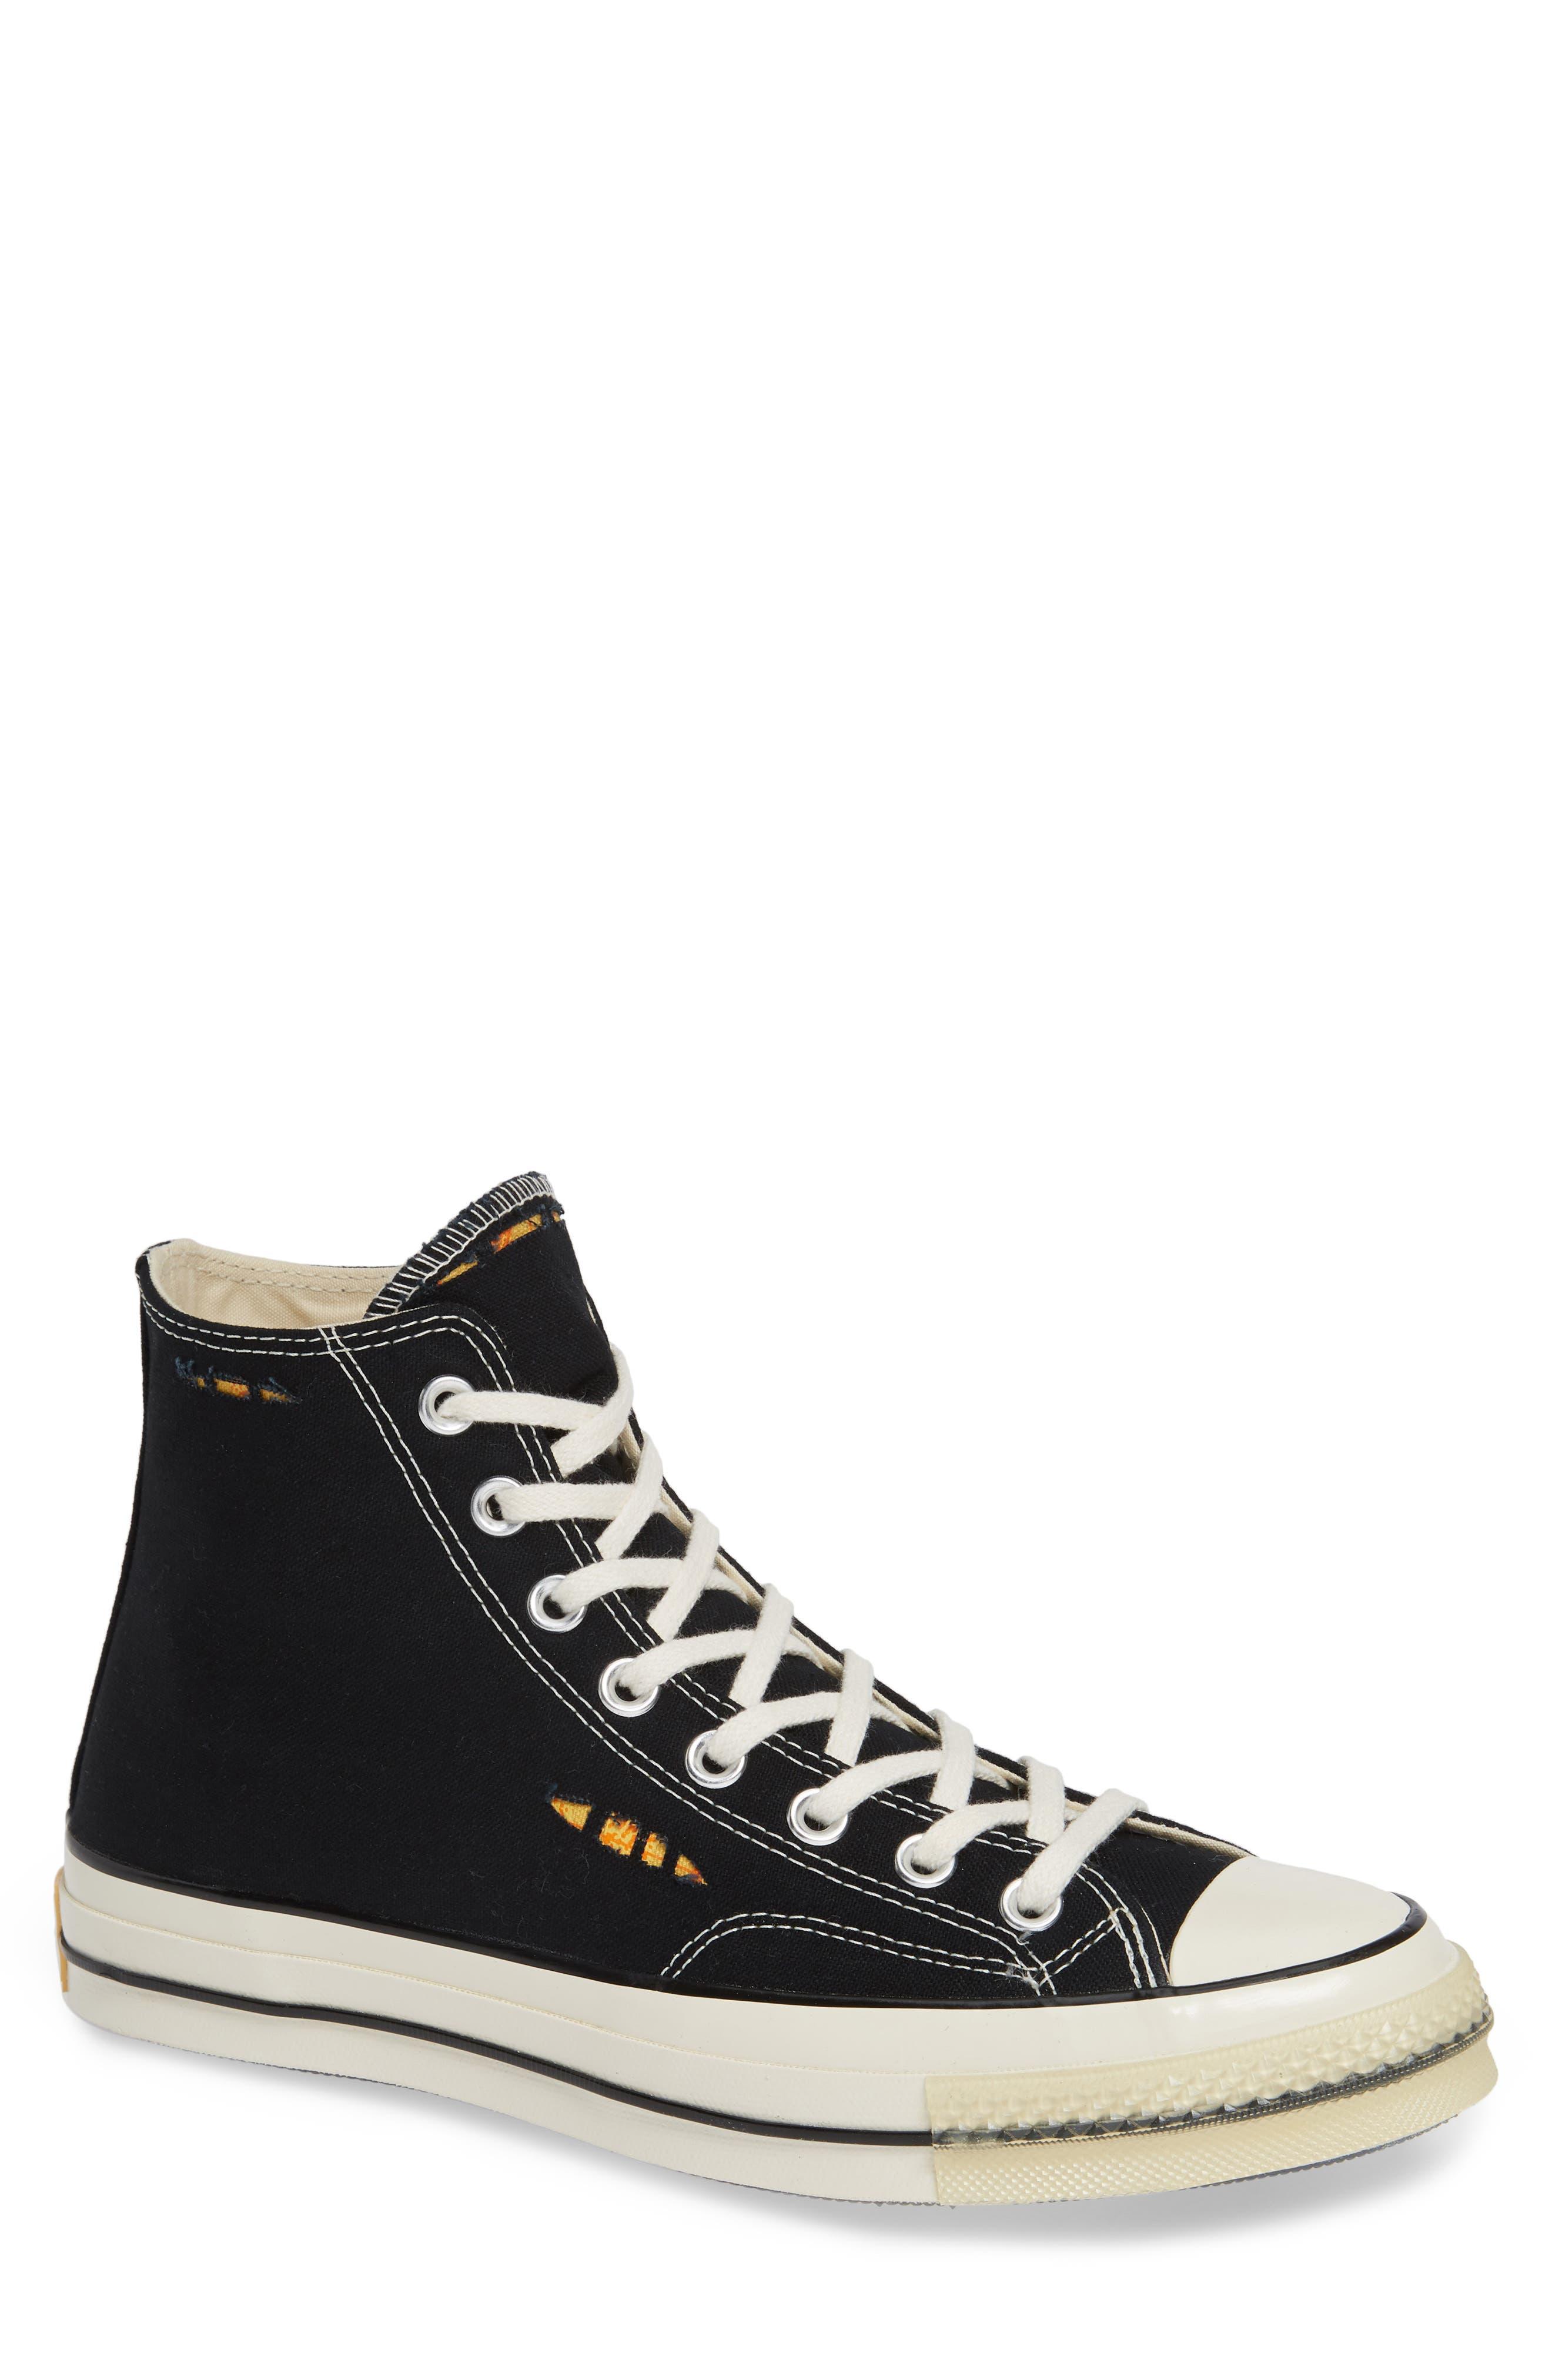 x Dr. Woo Chuck 70 Sneaker,                             Main thumbnail 1, color,                             001